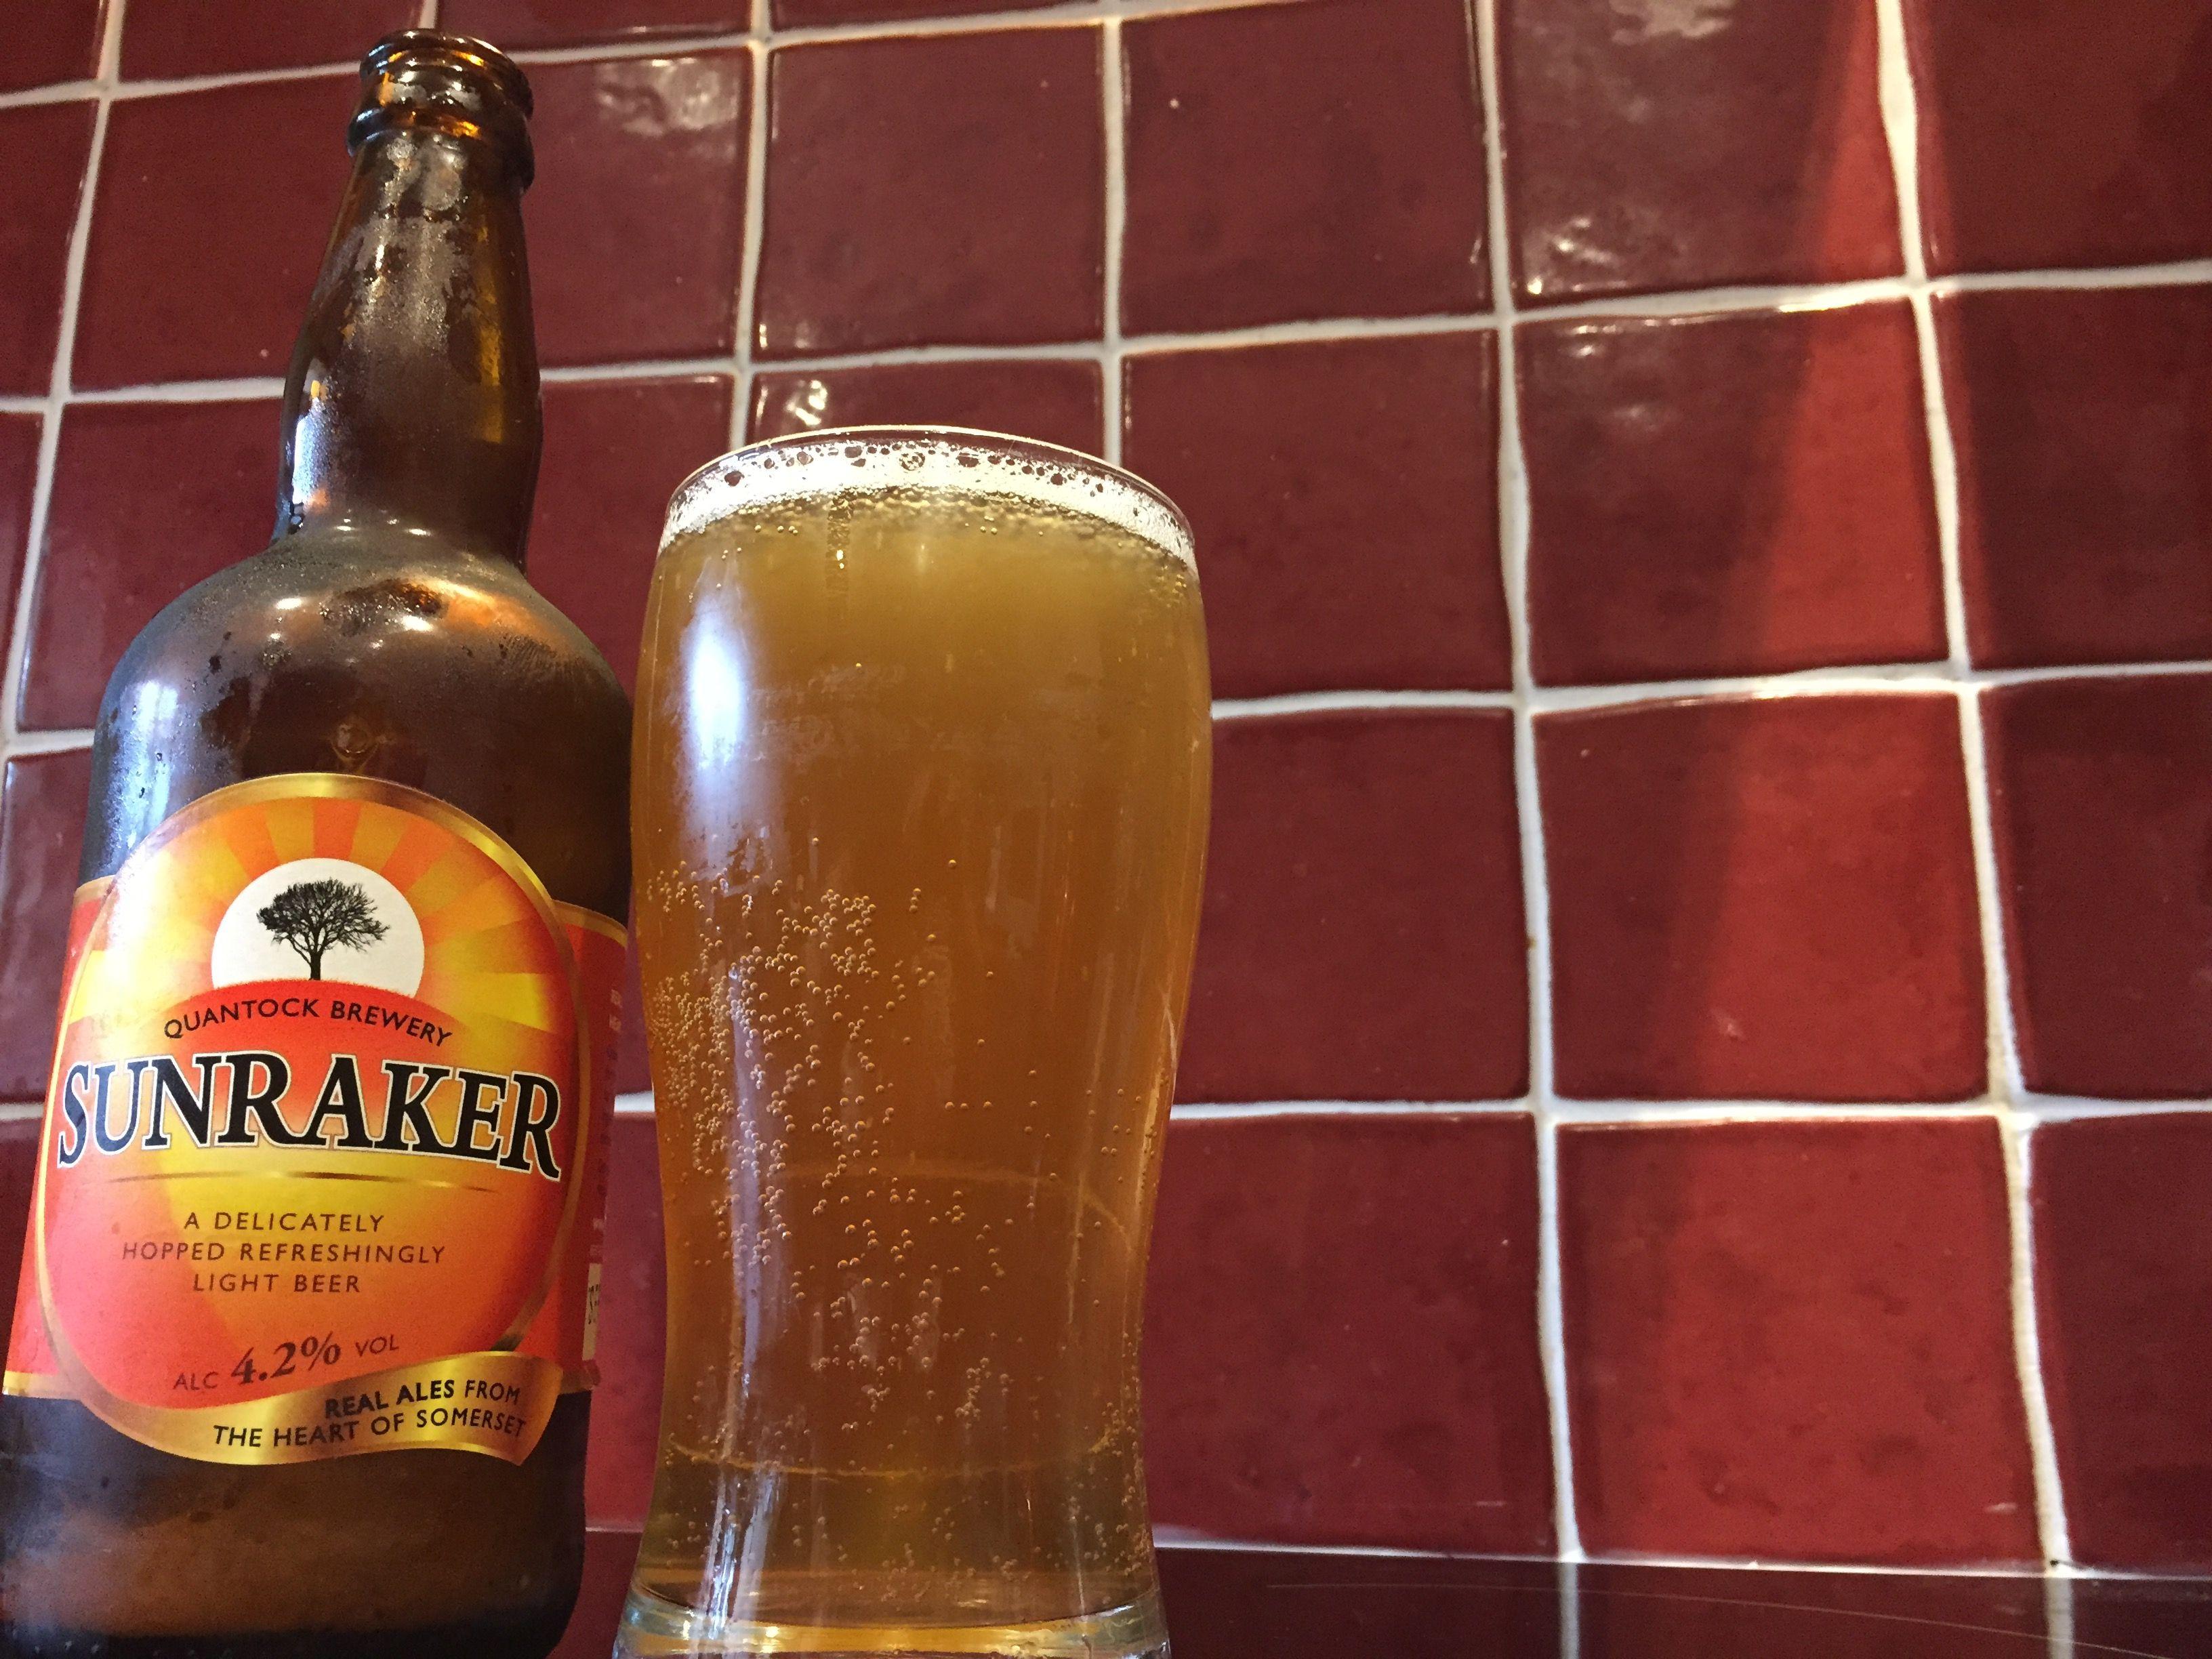 Quantock Brewery Sunraker